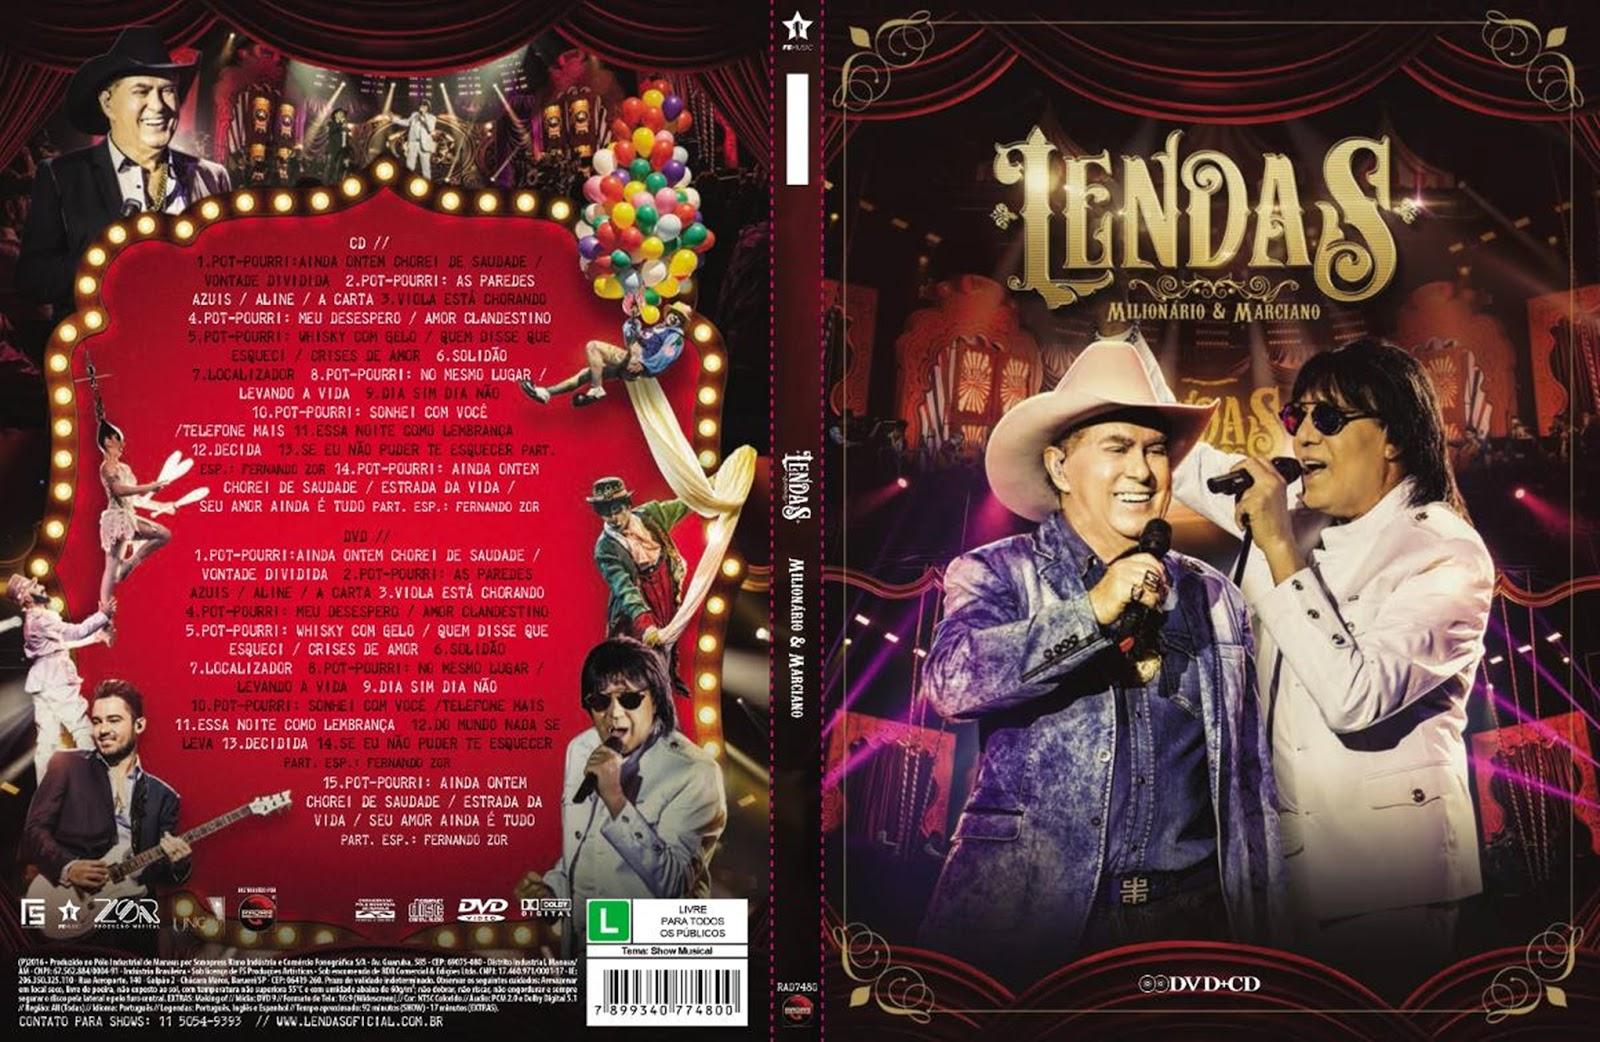 Milionário & Marciano Lendas DVDRip + DVD-R Milion 25C3 25A1rio 2B 2526 2BMarciano 2BLendas 2B2016 2B  2BXANDAODOWNLOAD